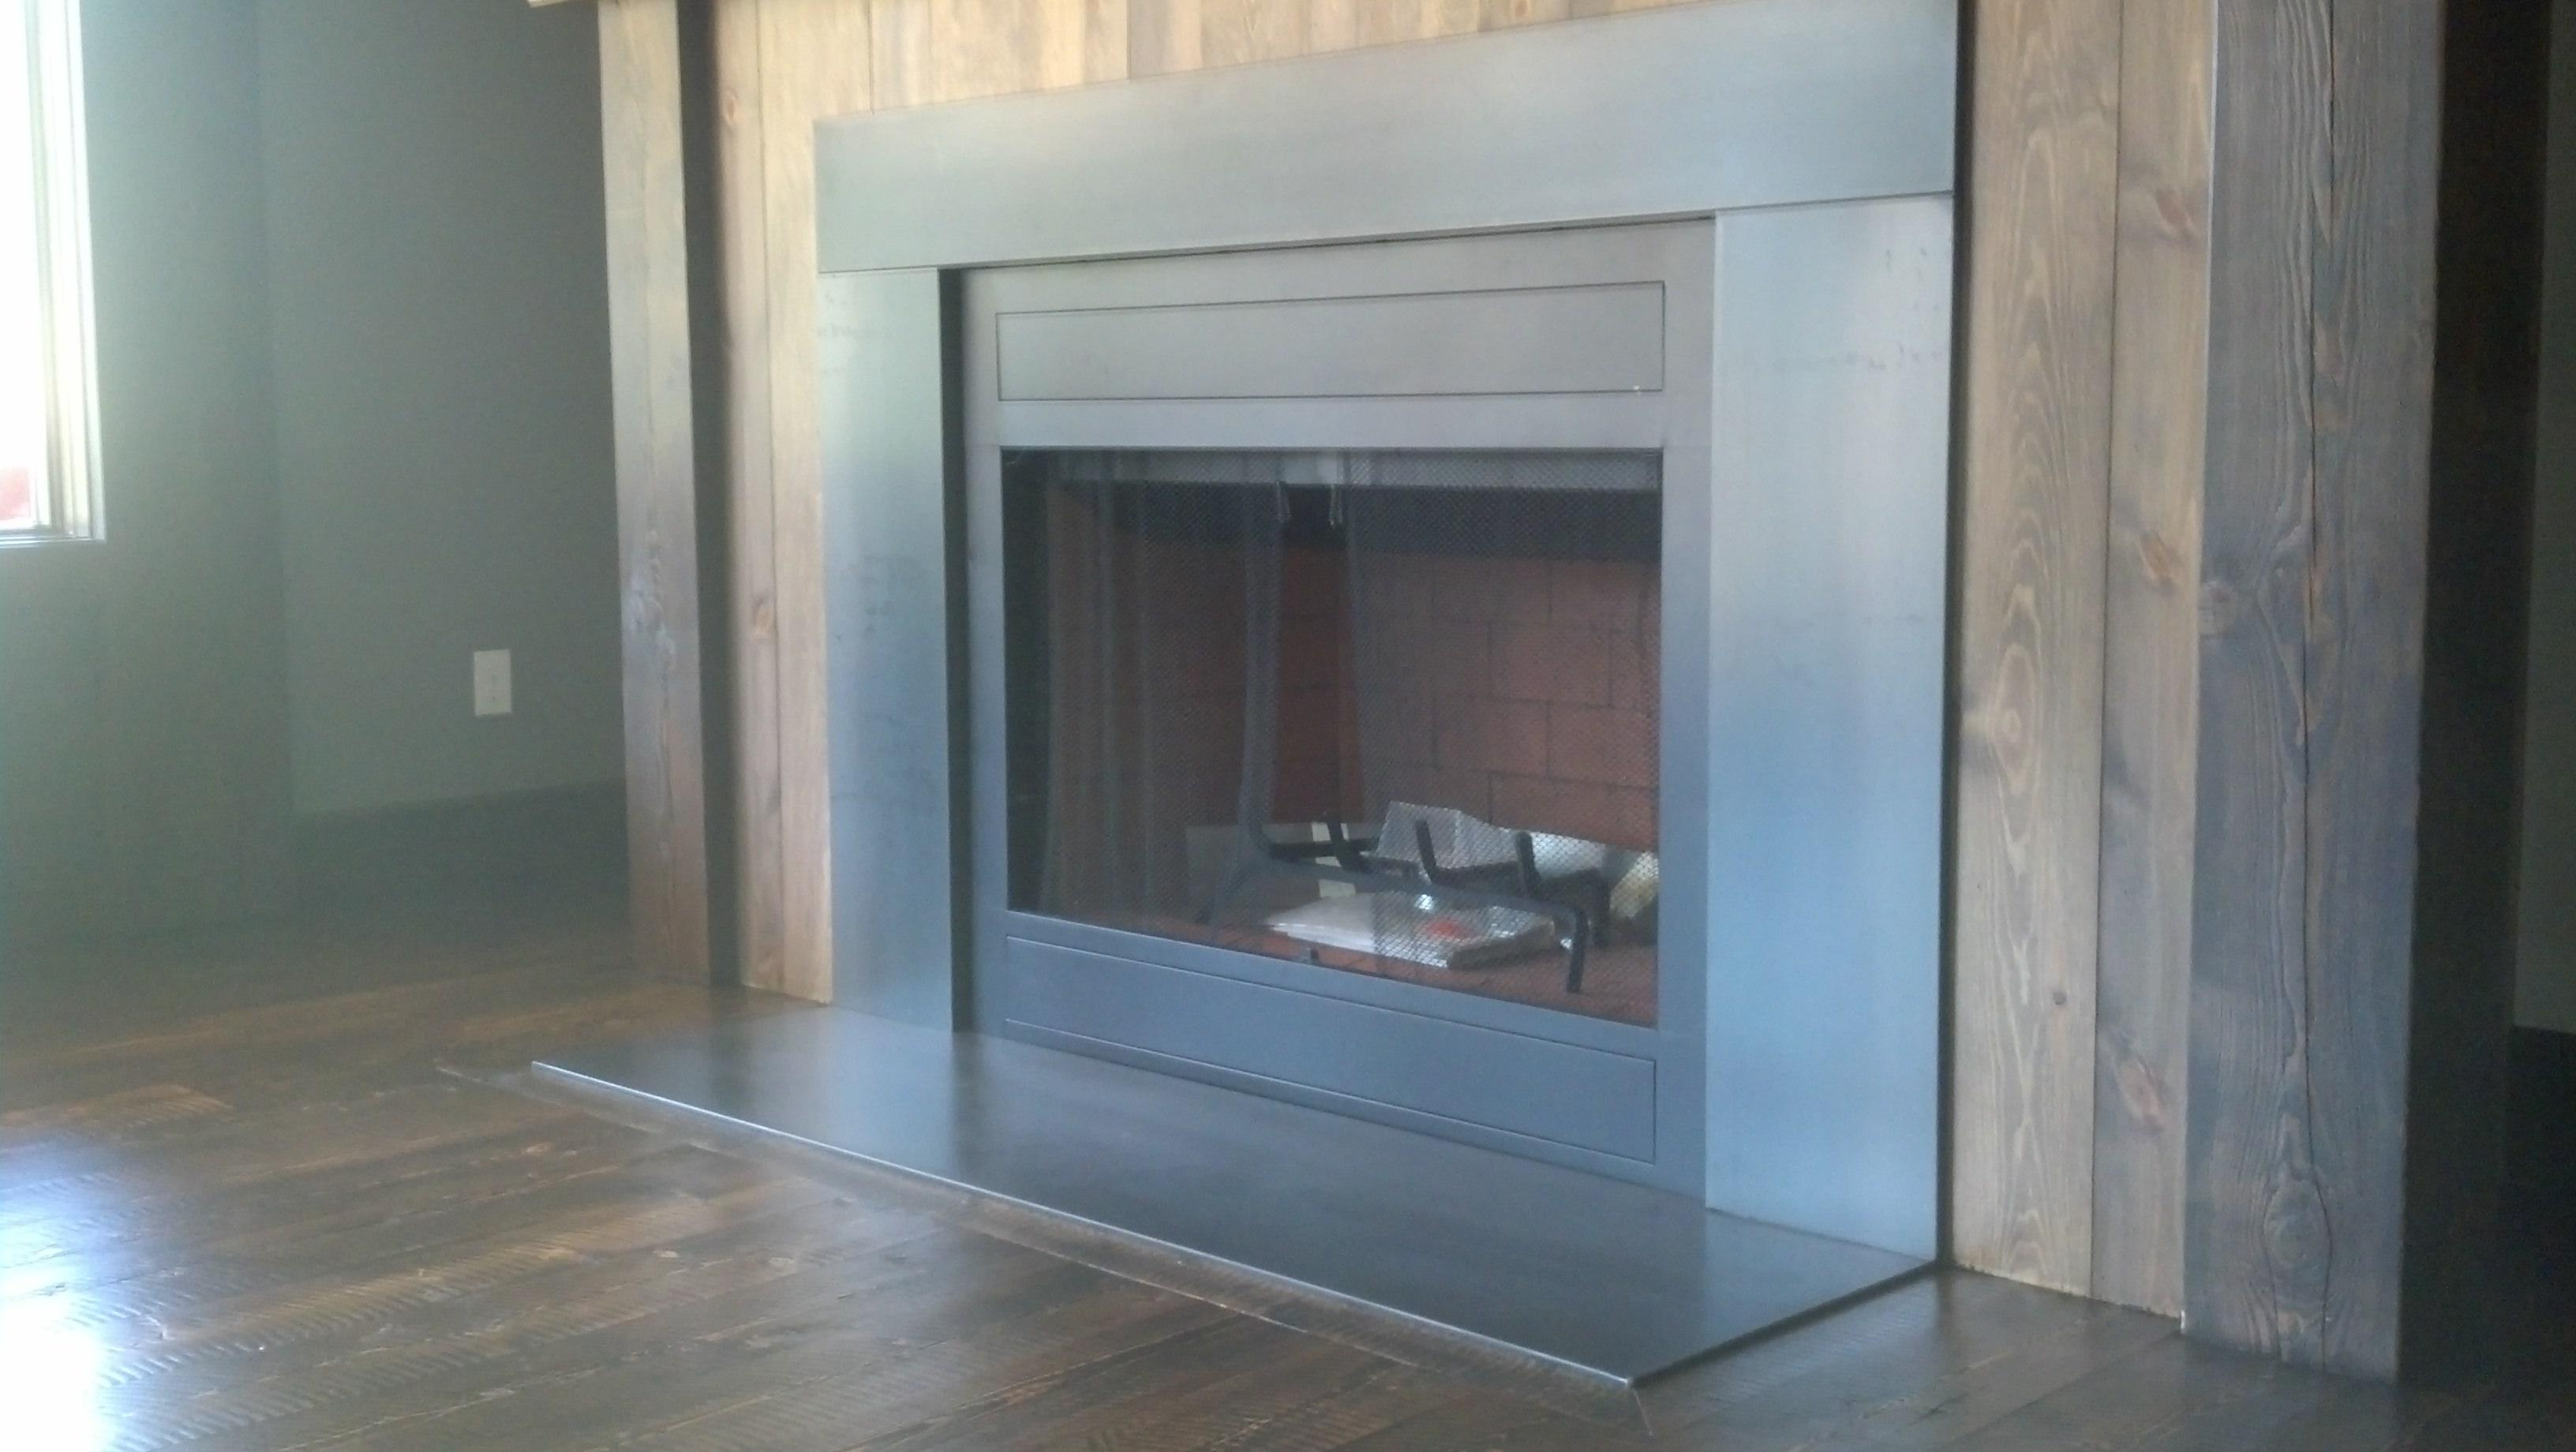 mccormack-fireplace-2